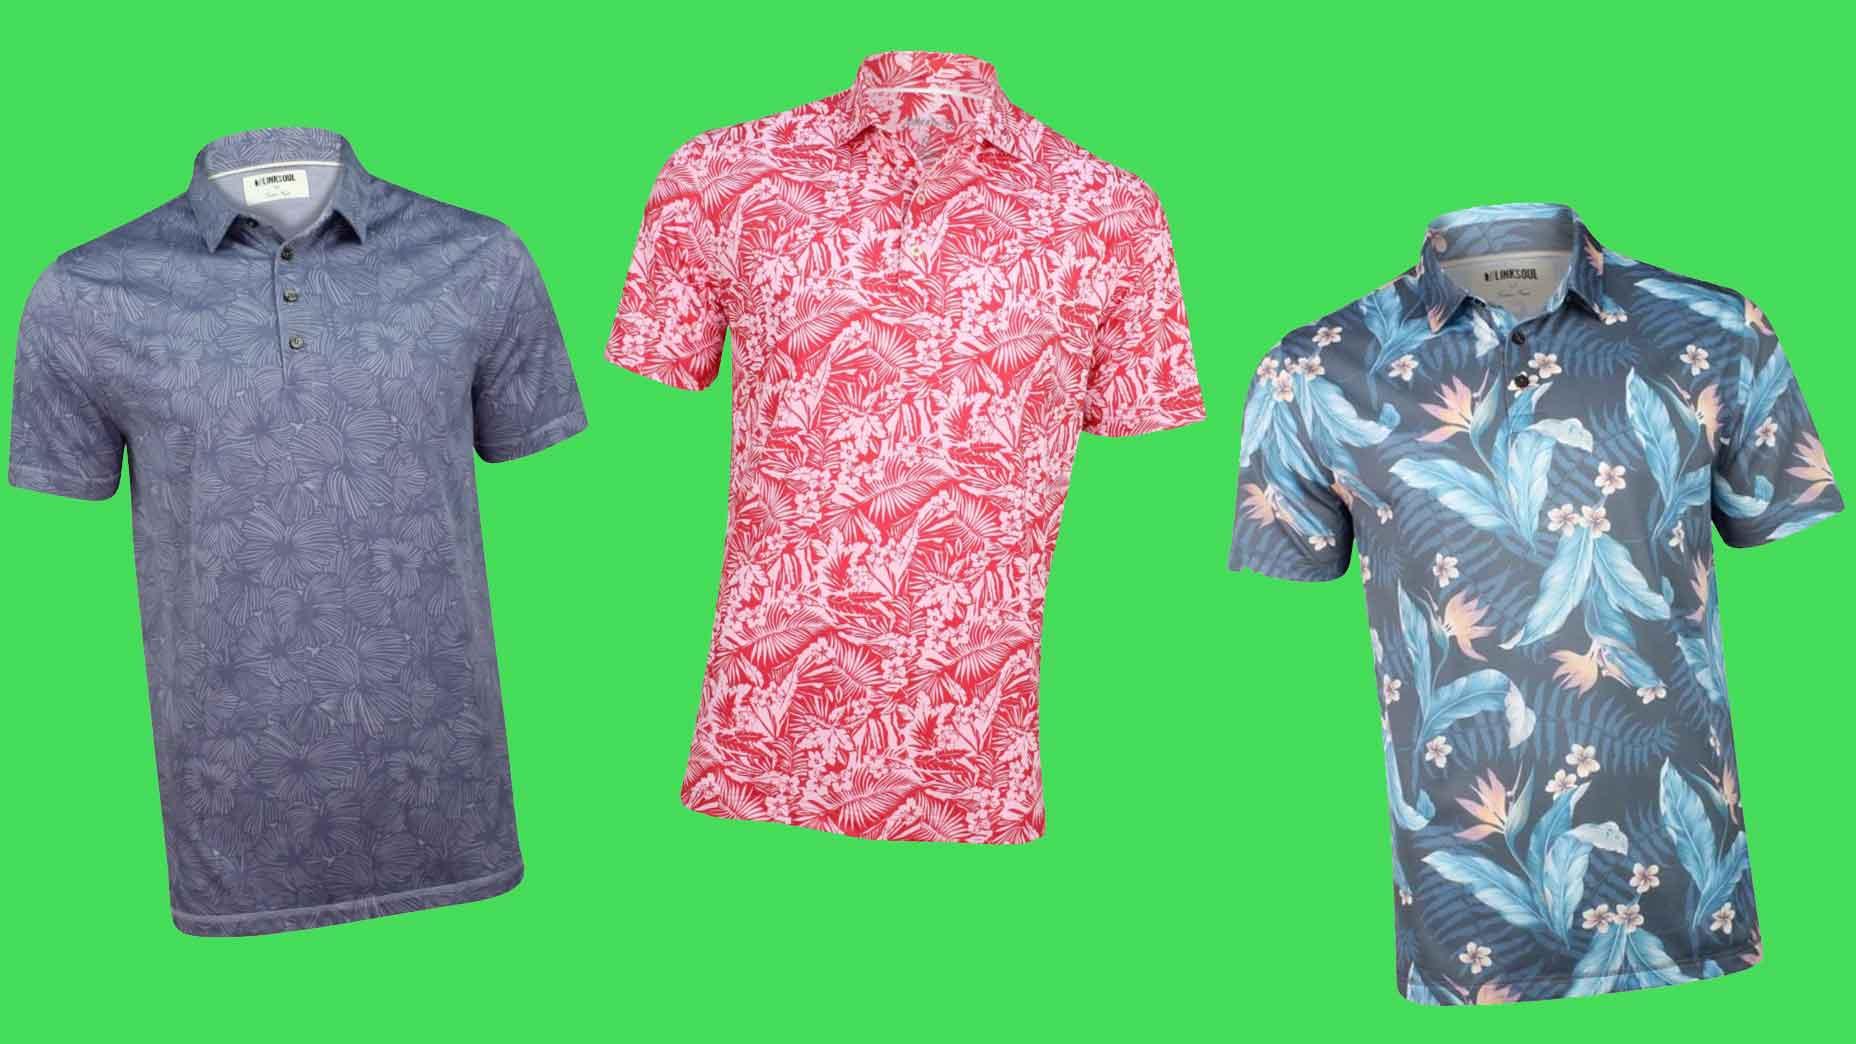 Tropical print polos